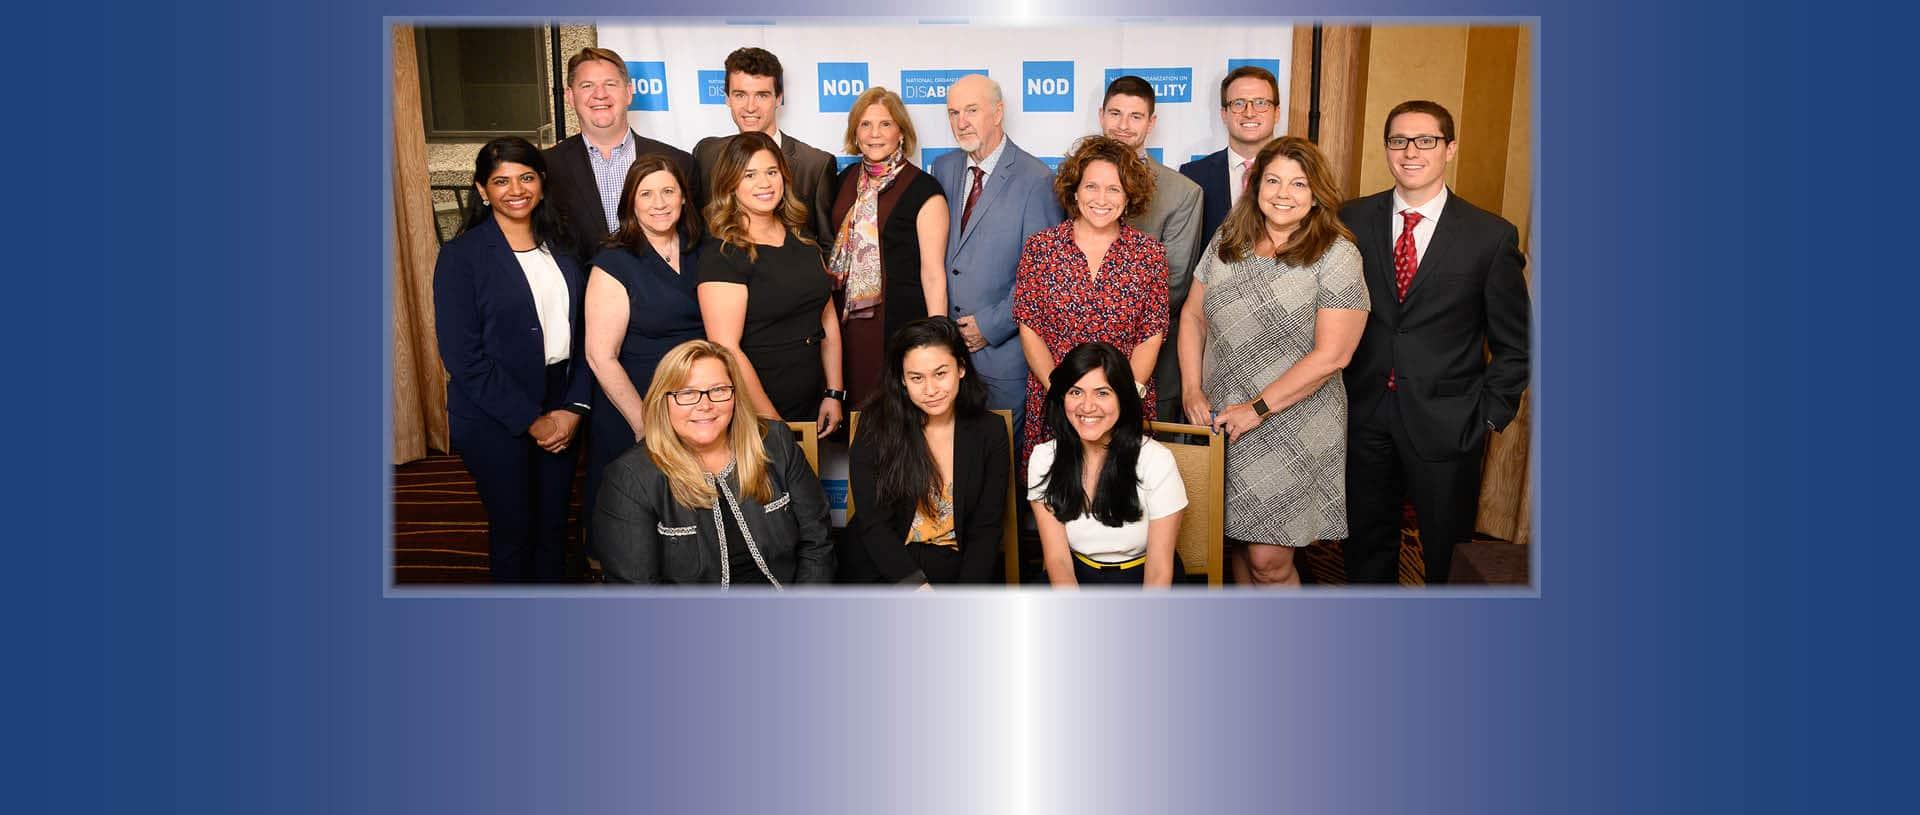 Group photo of NOD staff